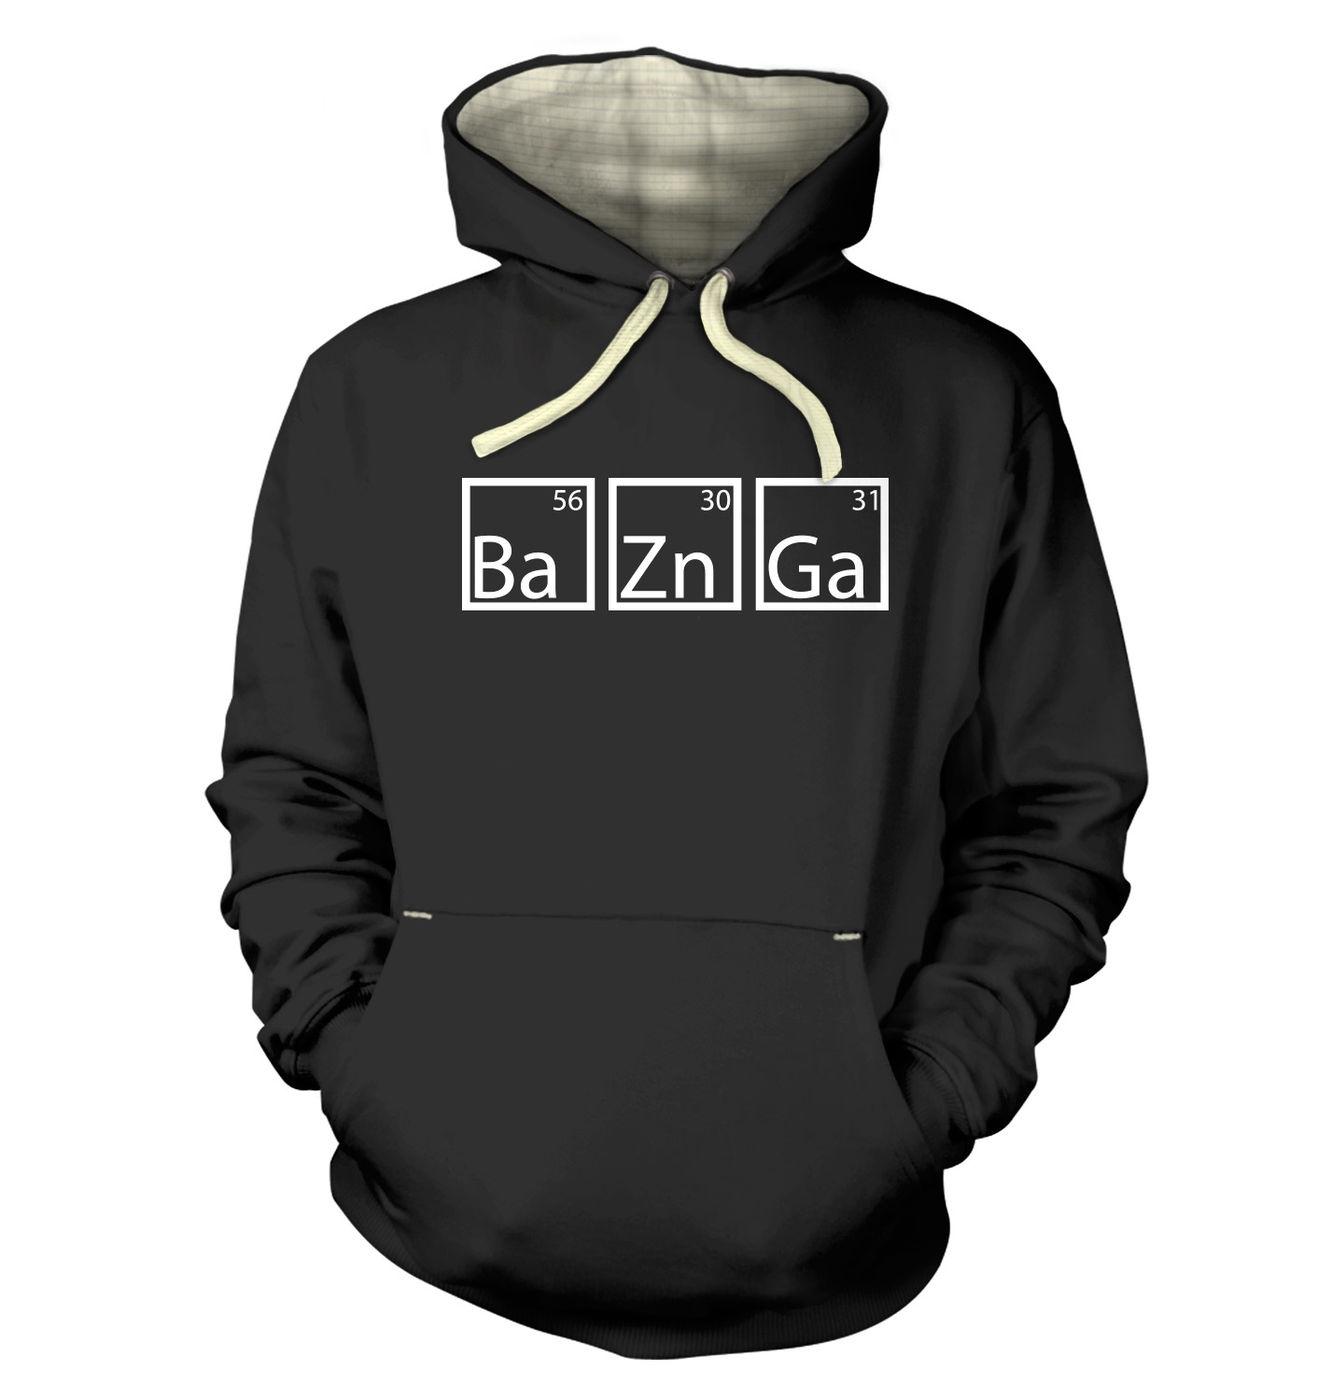 BaZnGa Premium Hoodie